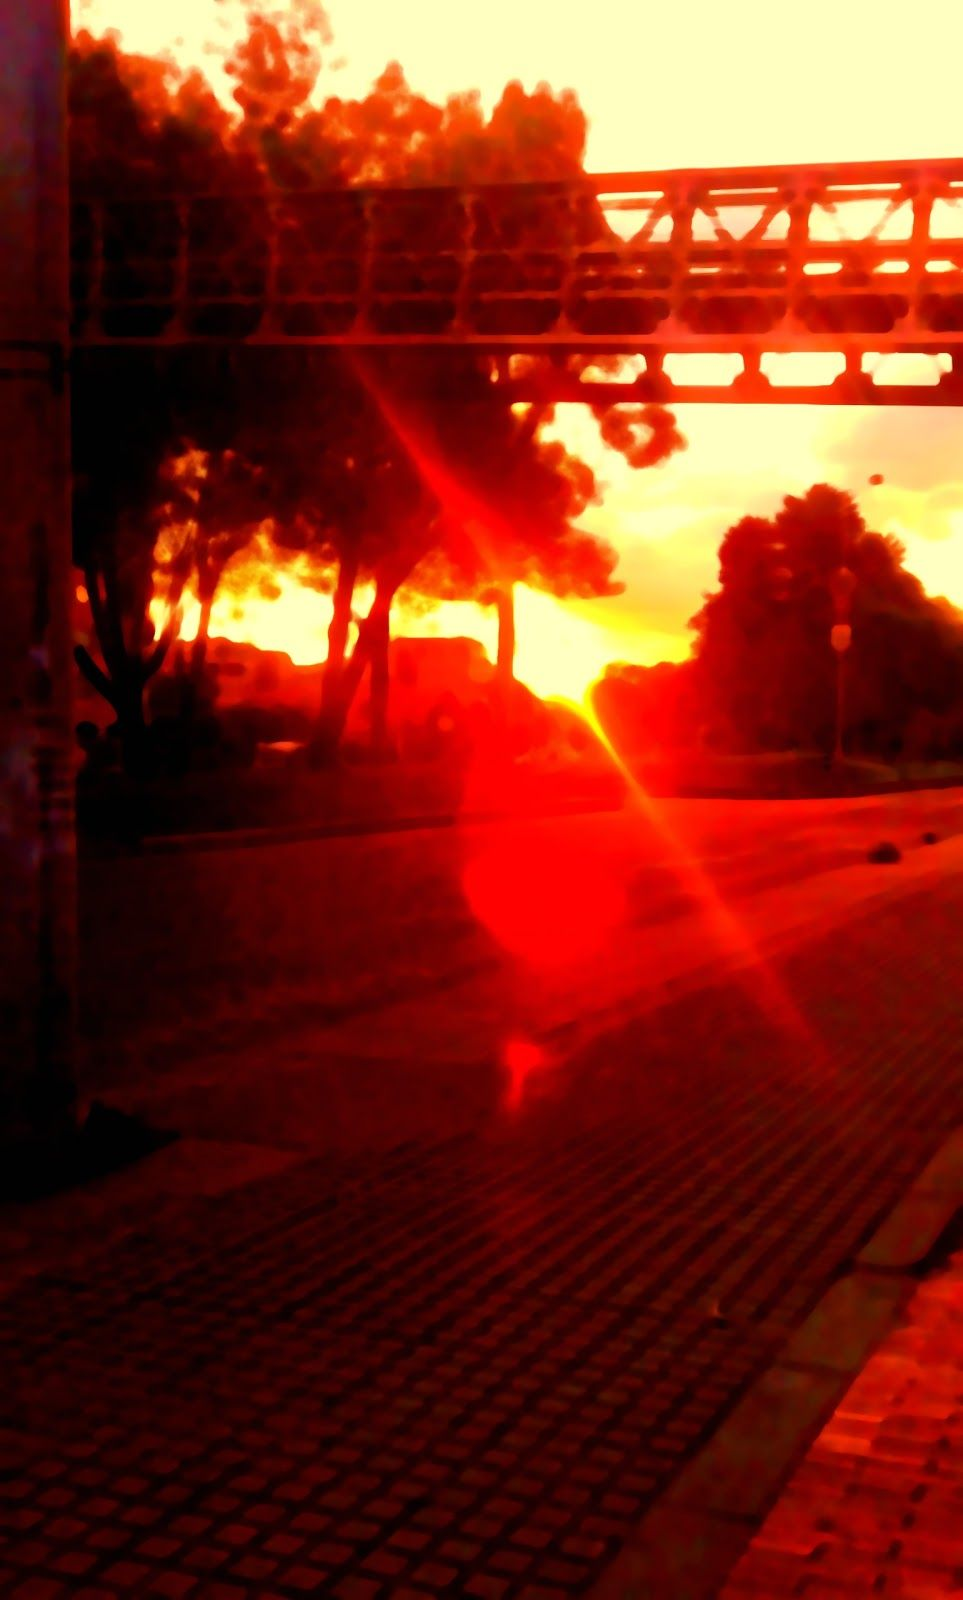 Algo tarde | Mista Vilteka